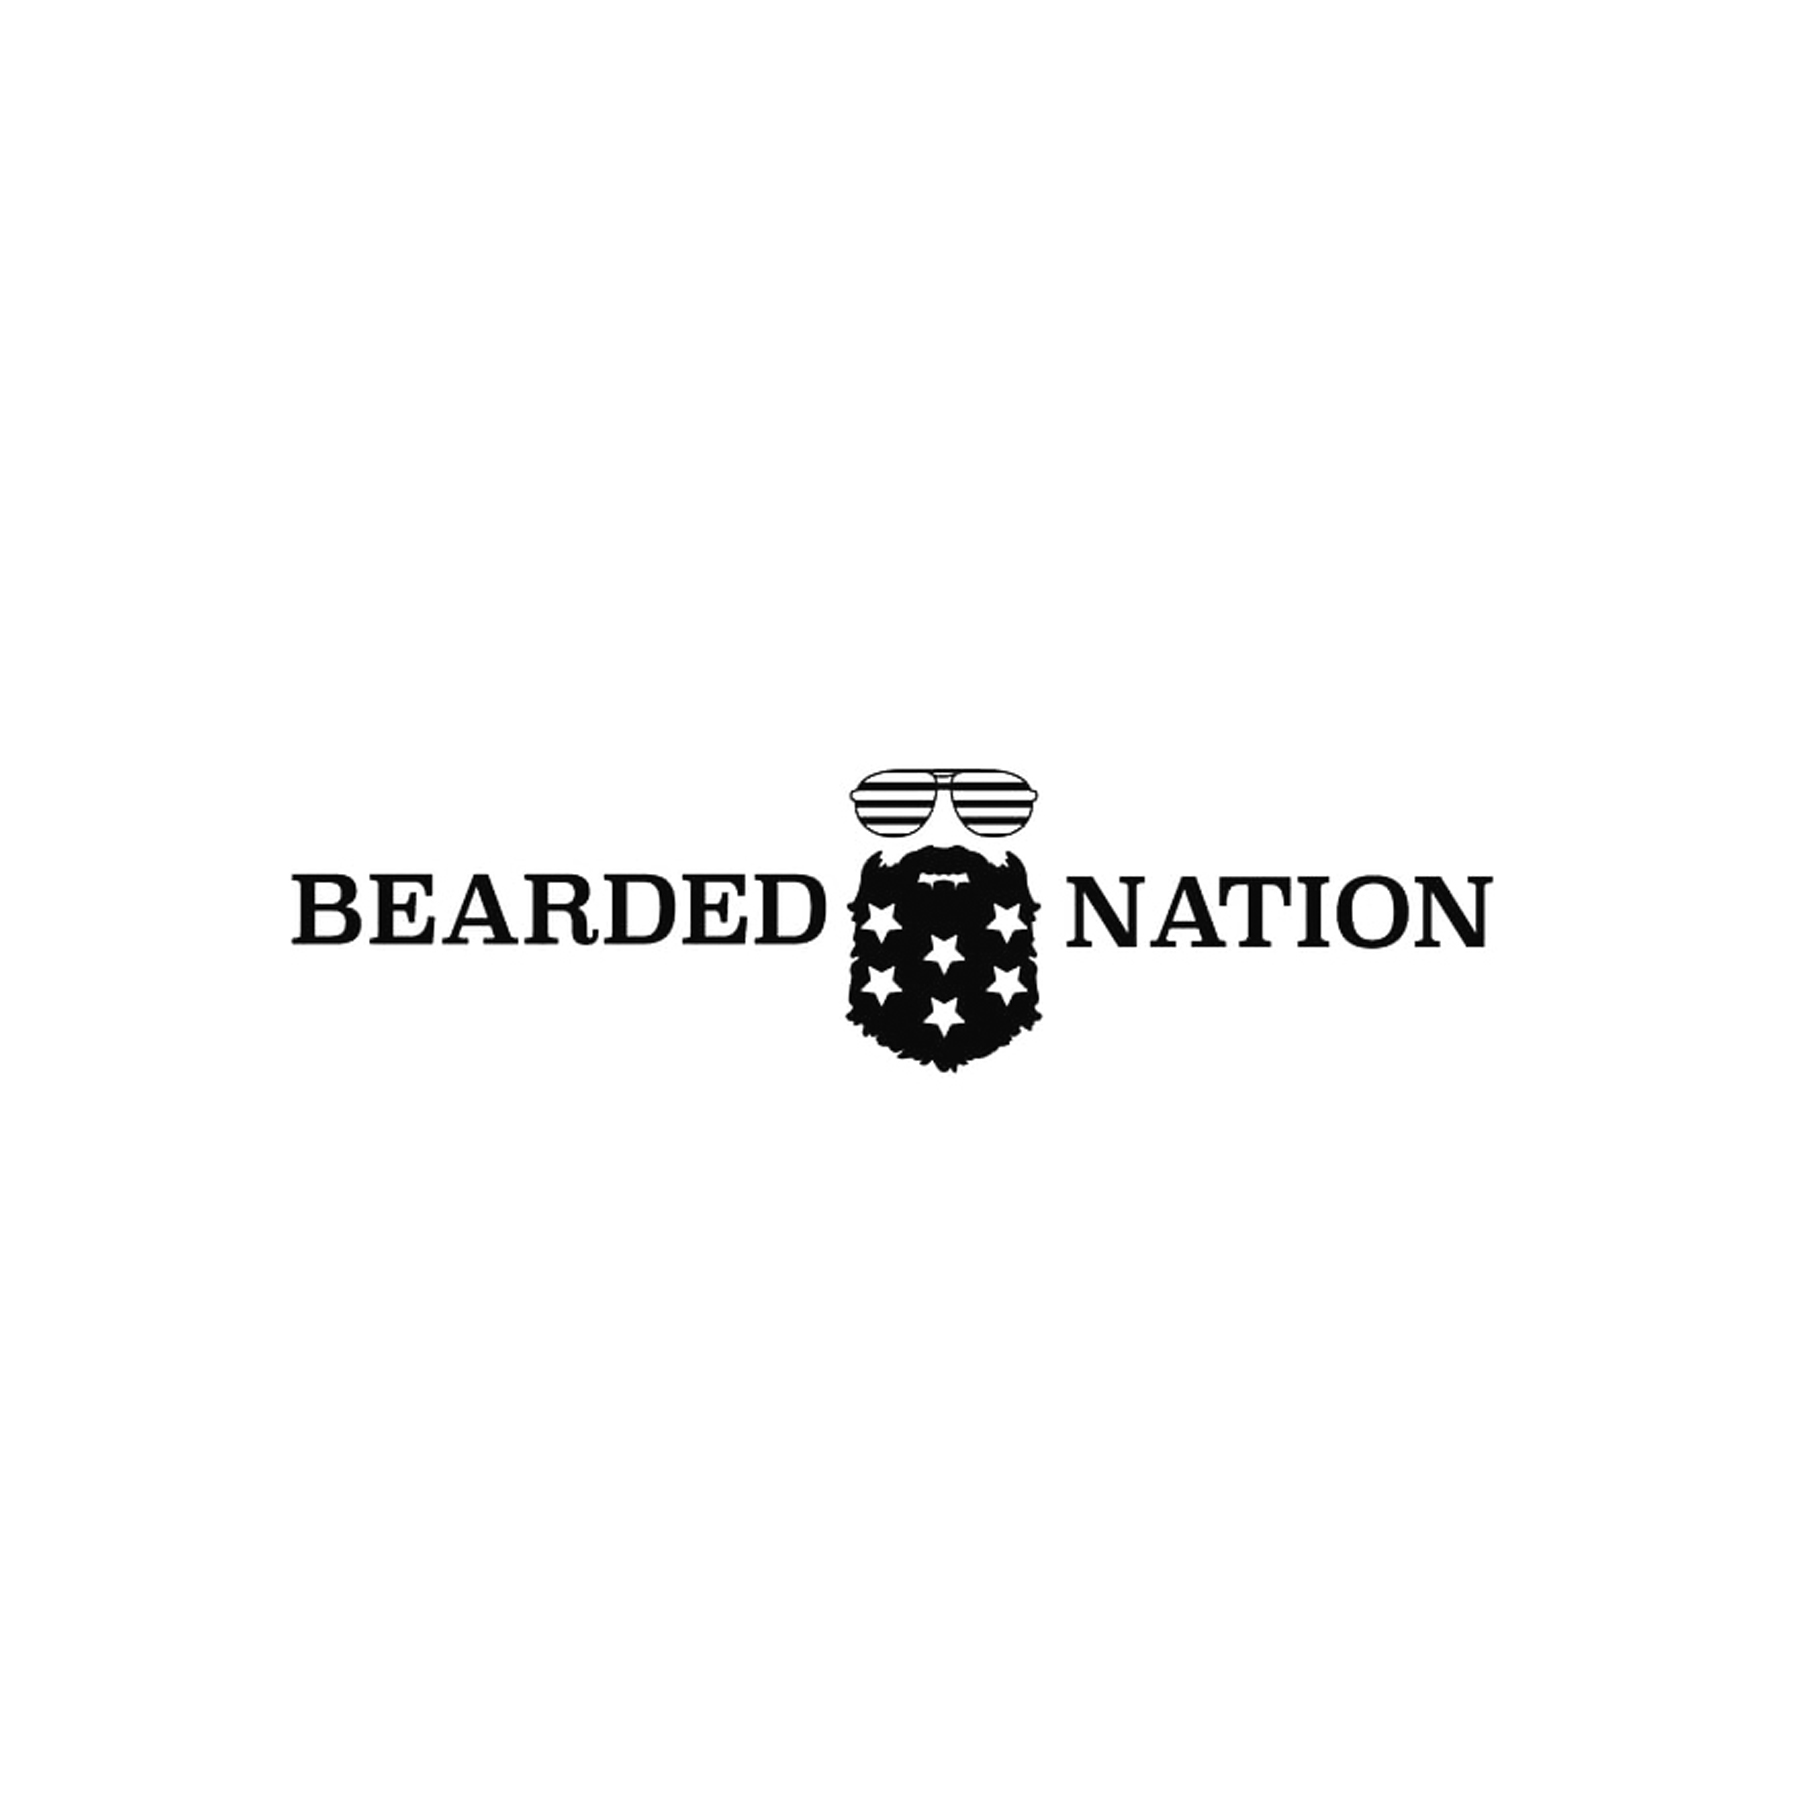 Bearded Nation